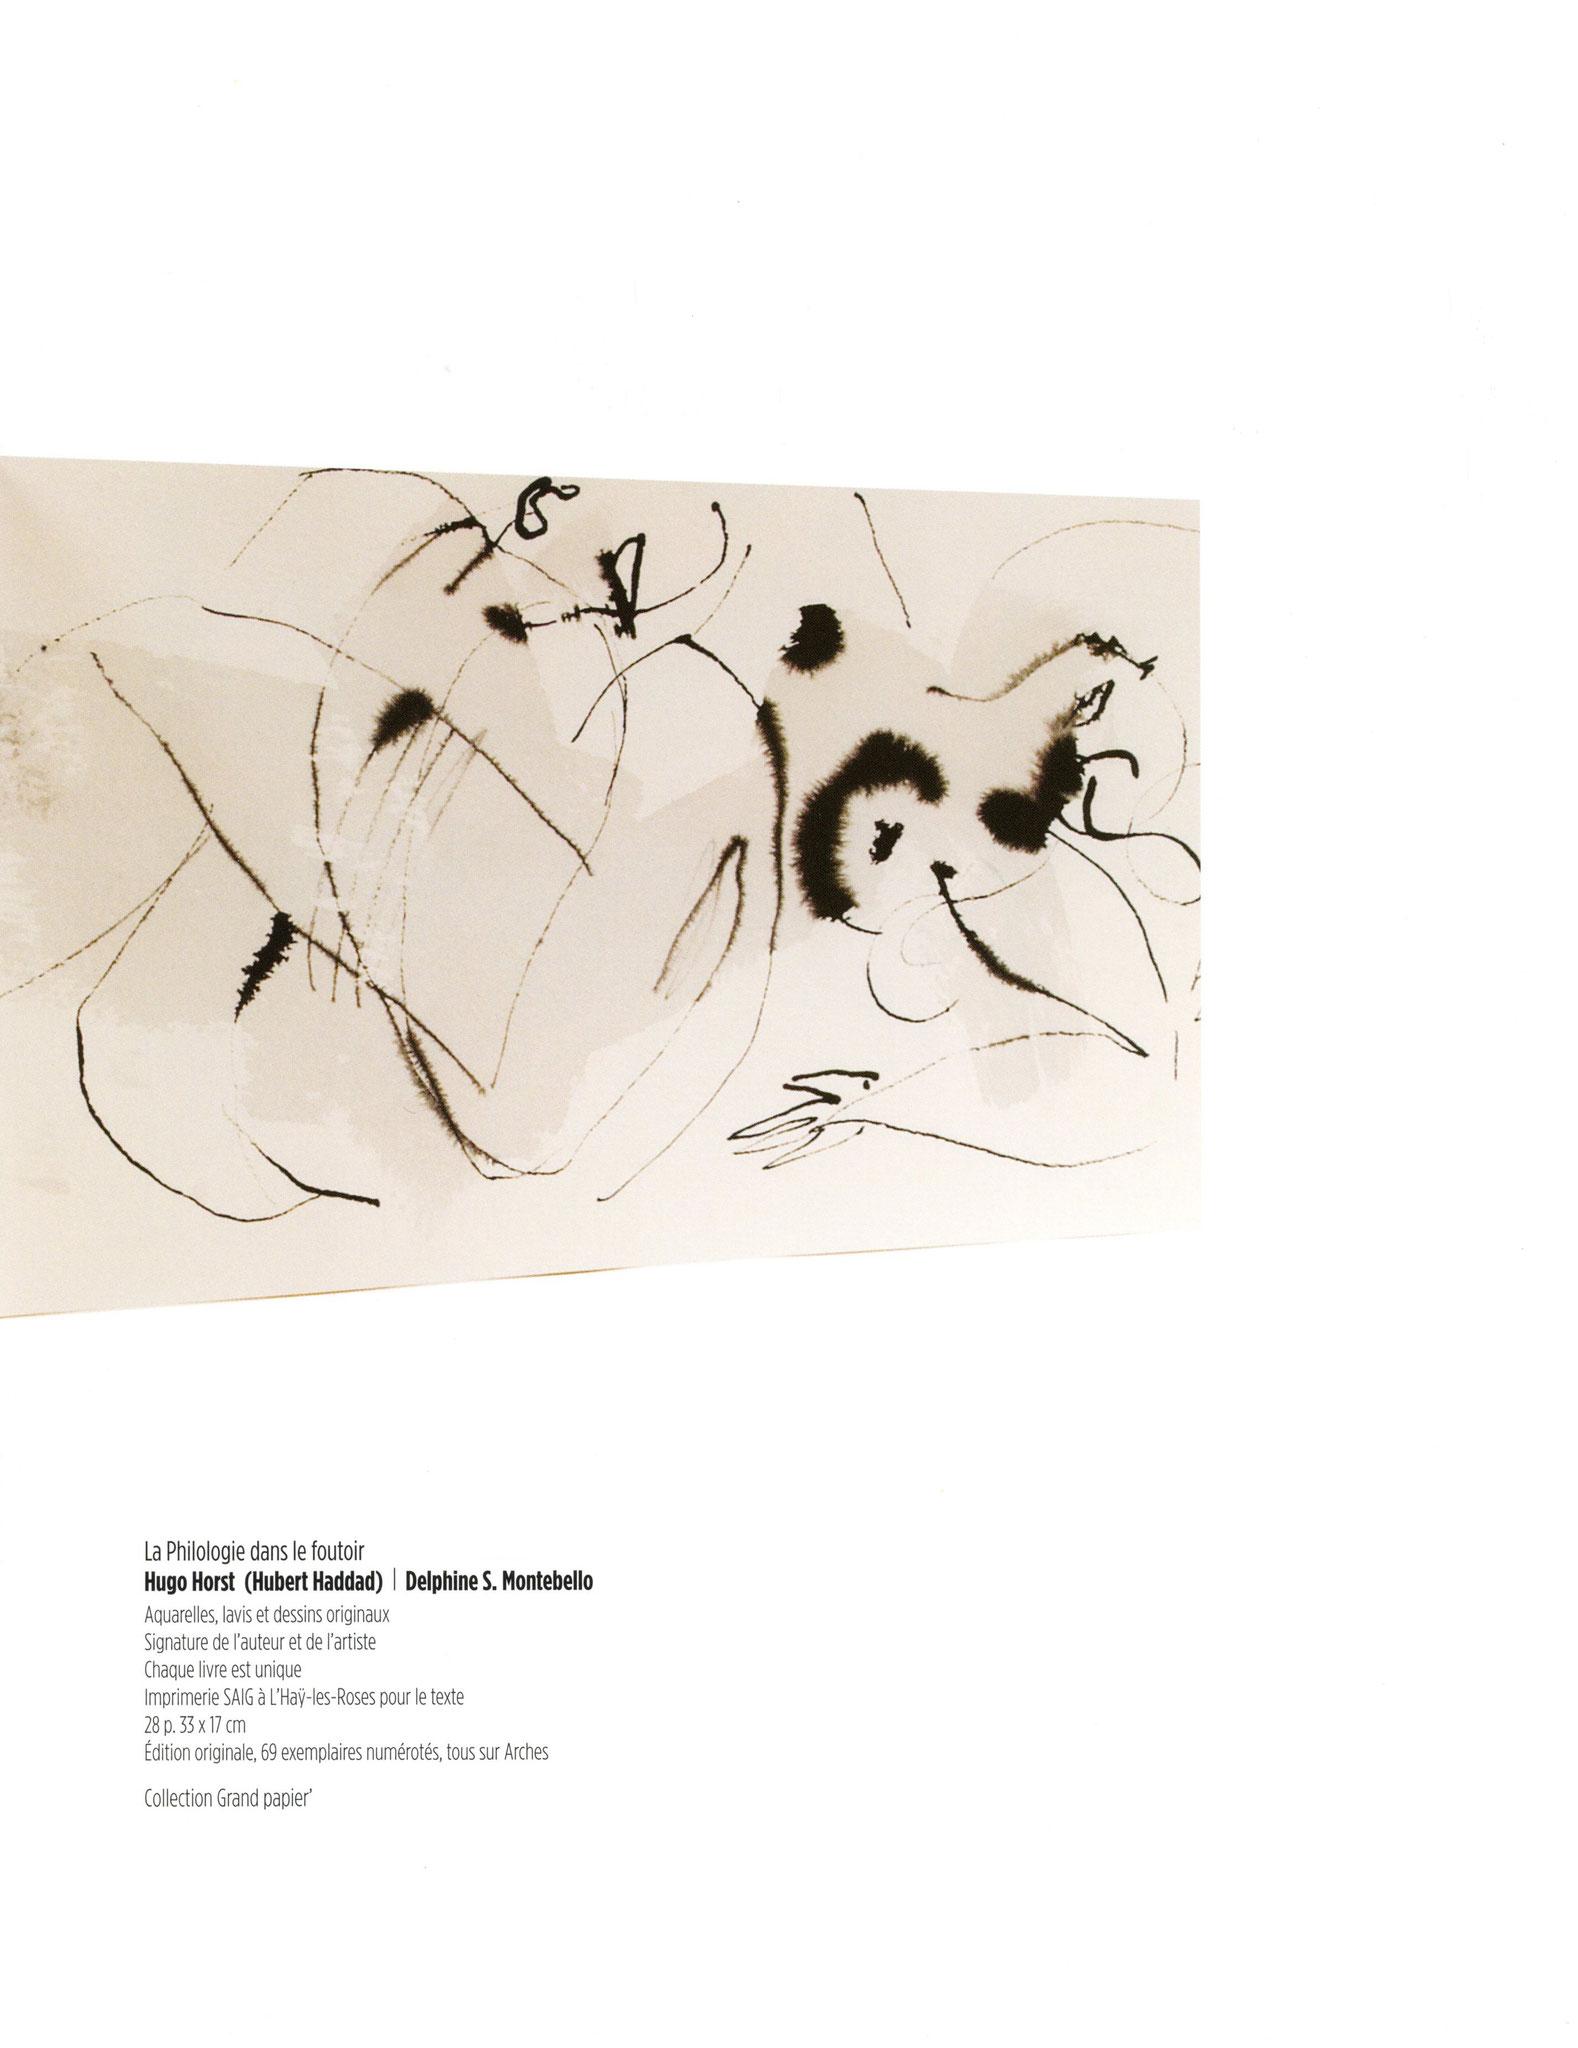 La Philosophie dans le foutoir - Hugo Horst (Hubert Haddad) / Delphine S. Montebello